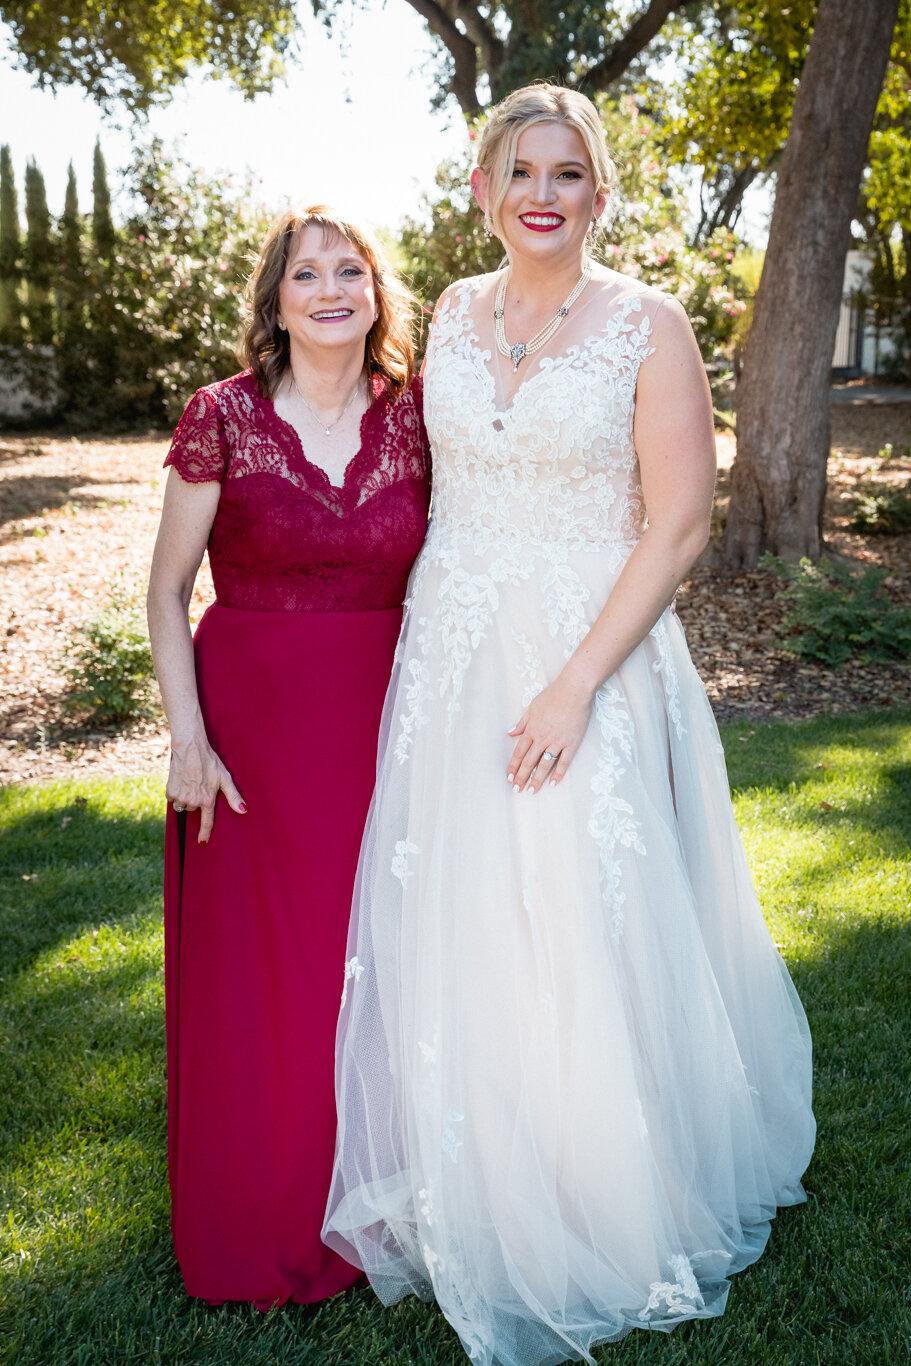 2019.08.24_Emily-Ashir-Wedding-at-the-Maples-5580.jpg